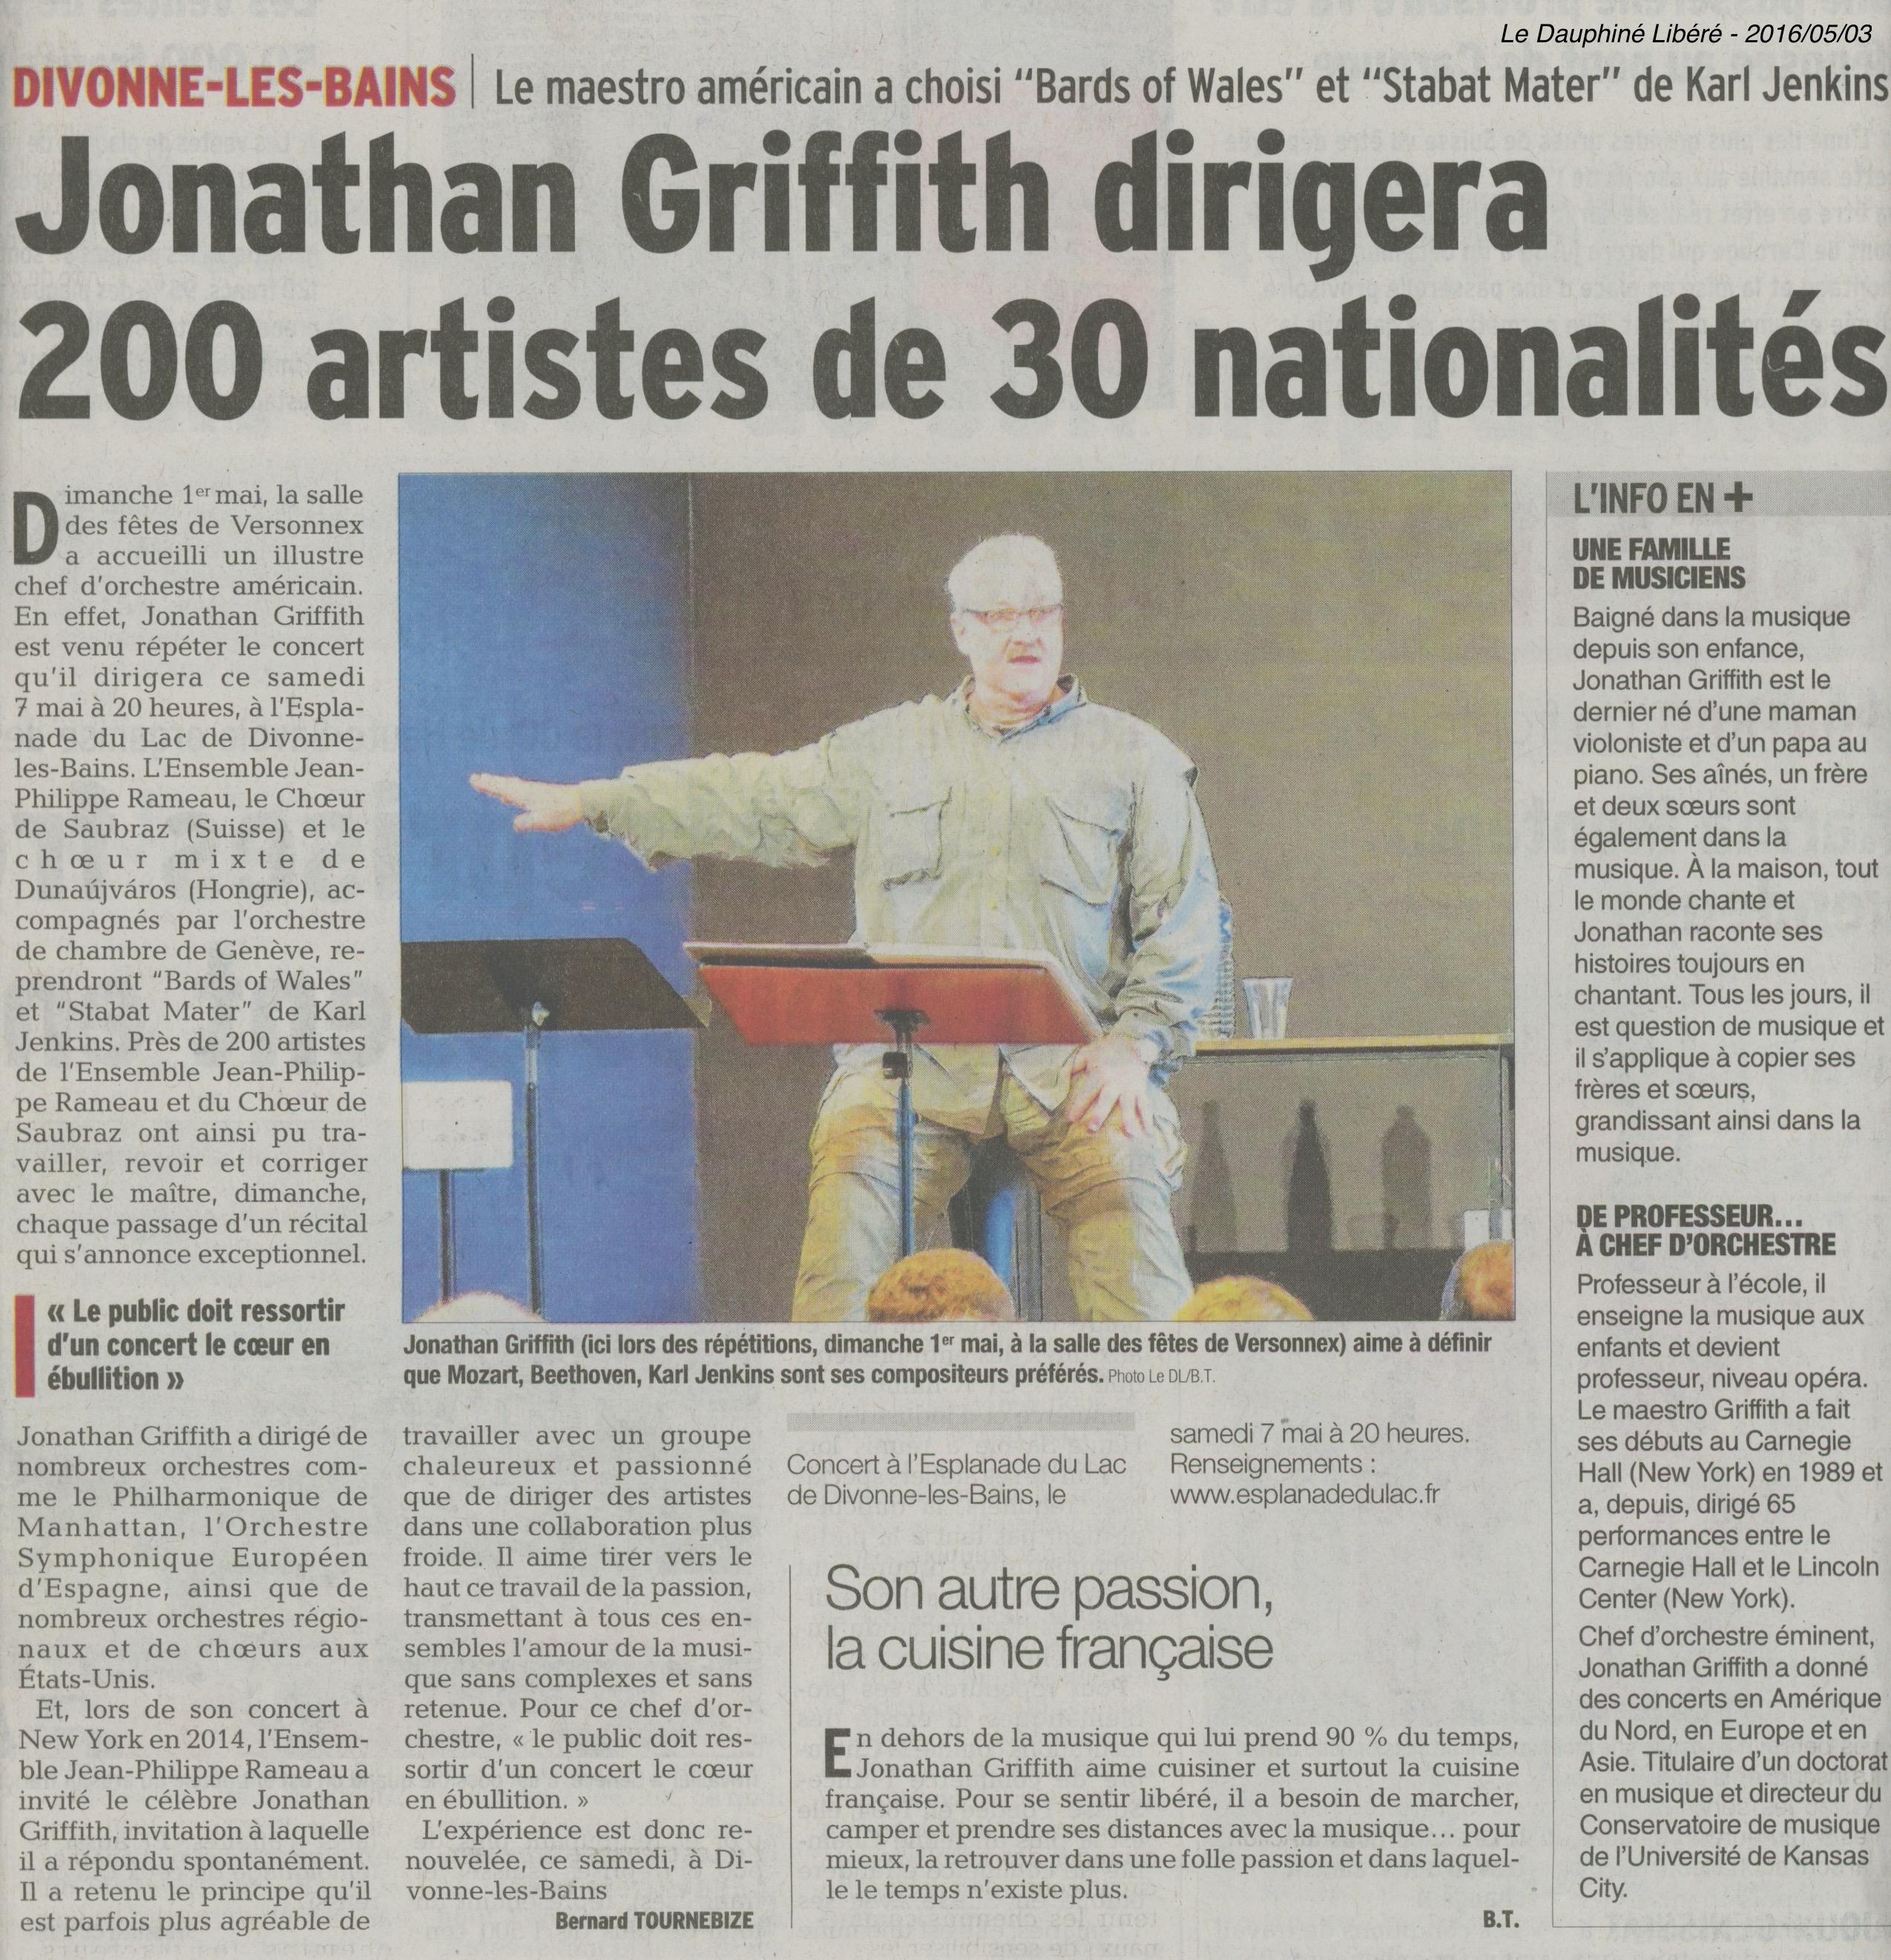 Jonathan Griffith dirigera 200 artistes